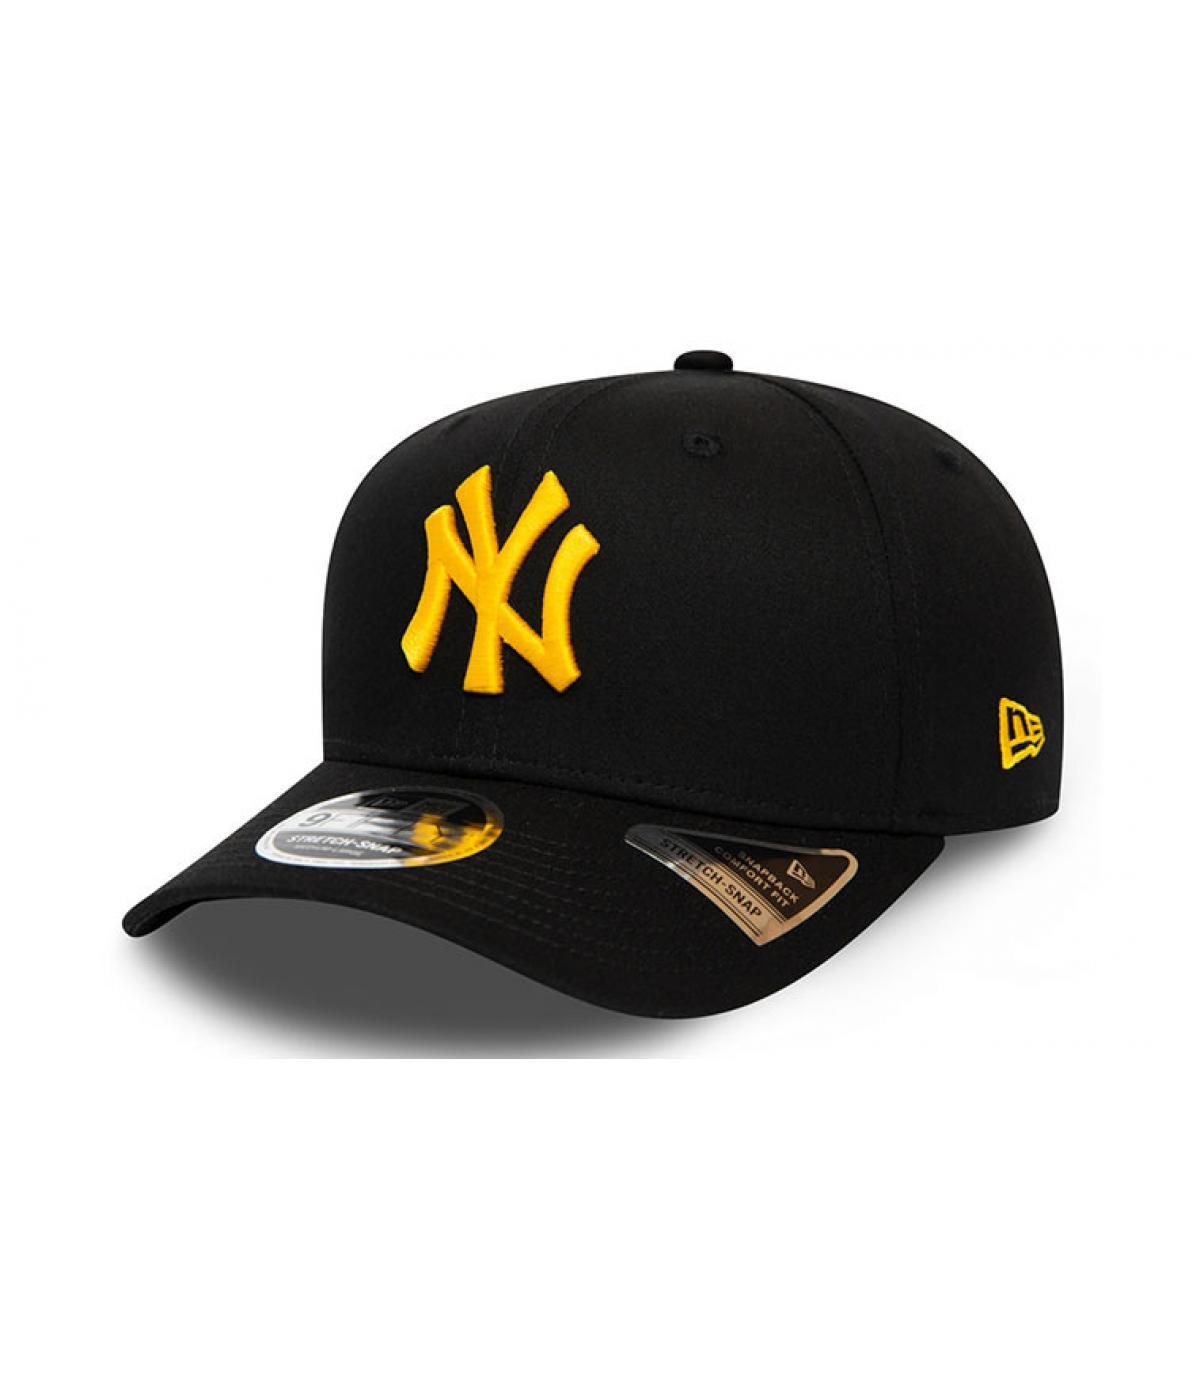 NY Cap schwarz gelb